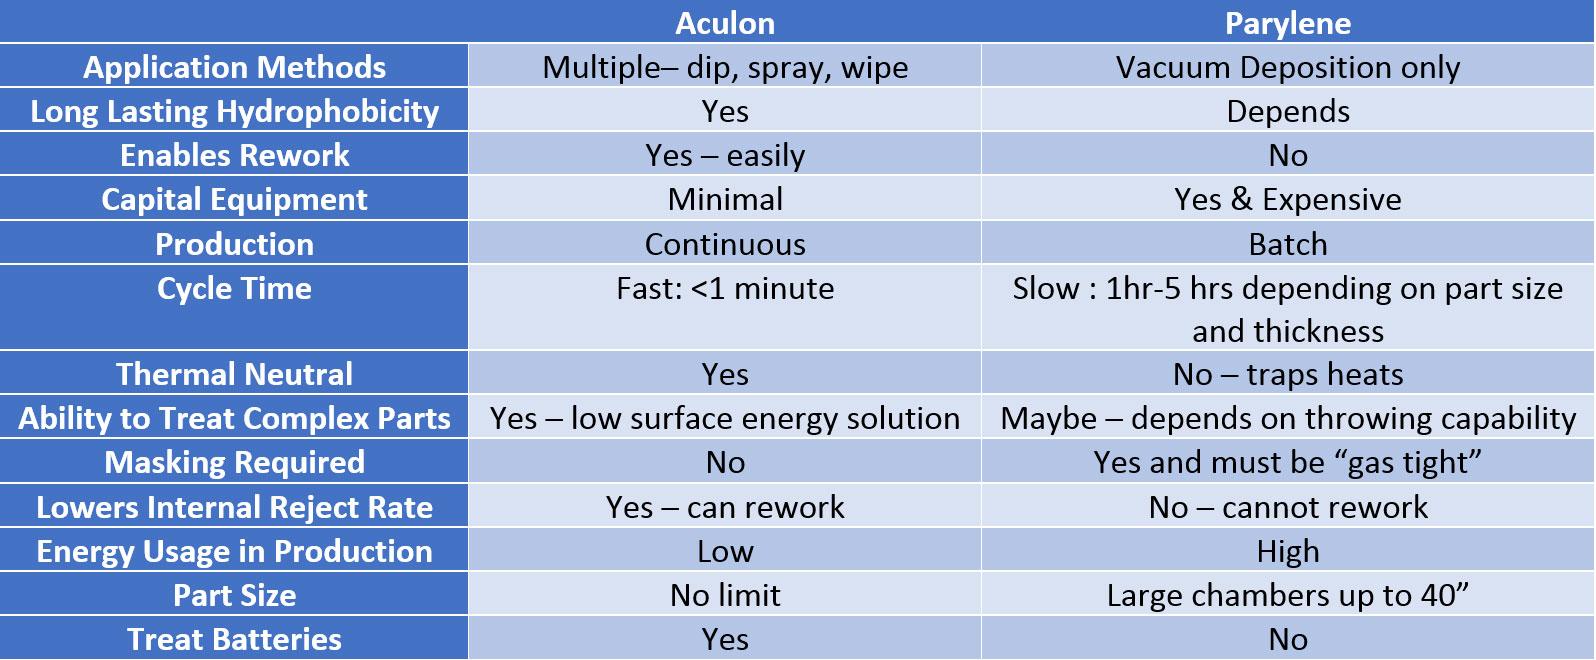 Aculon vs leading parylene coatings